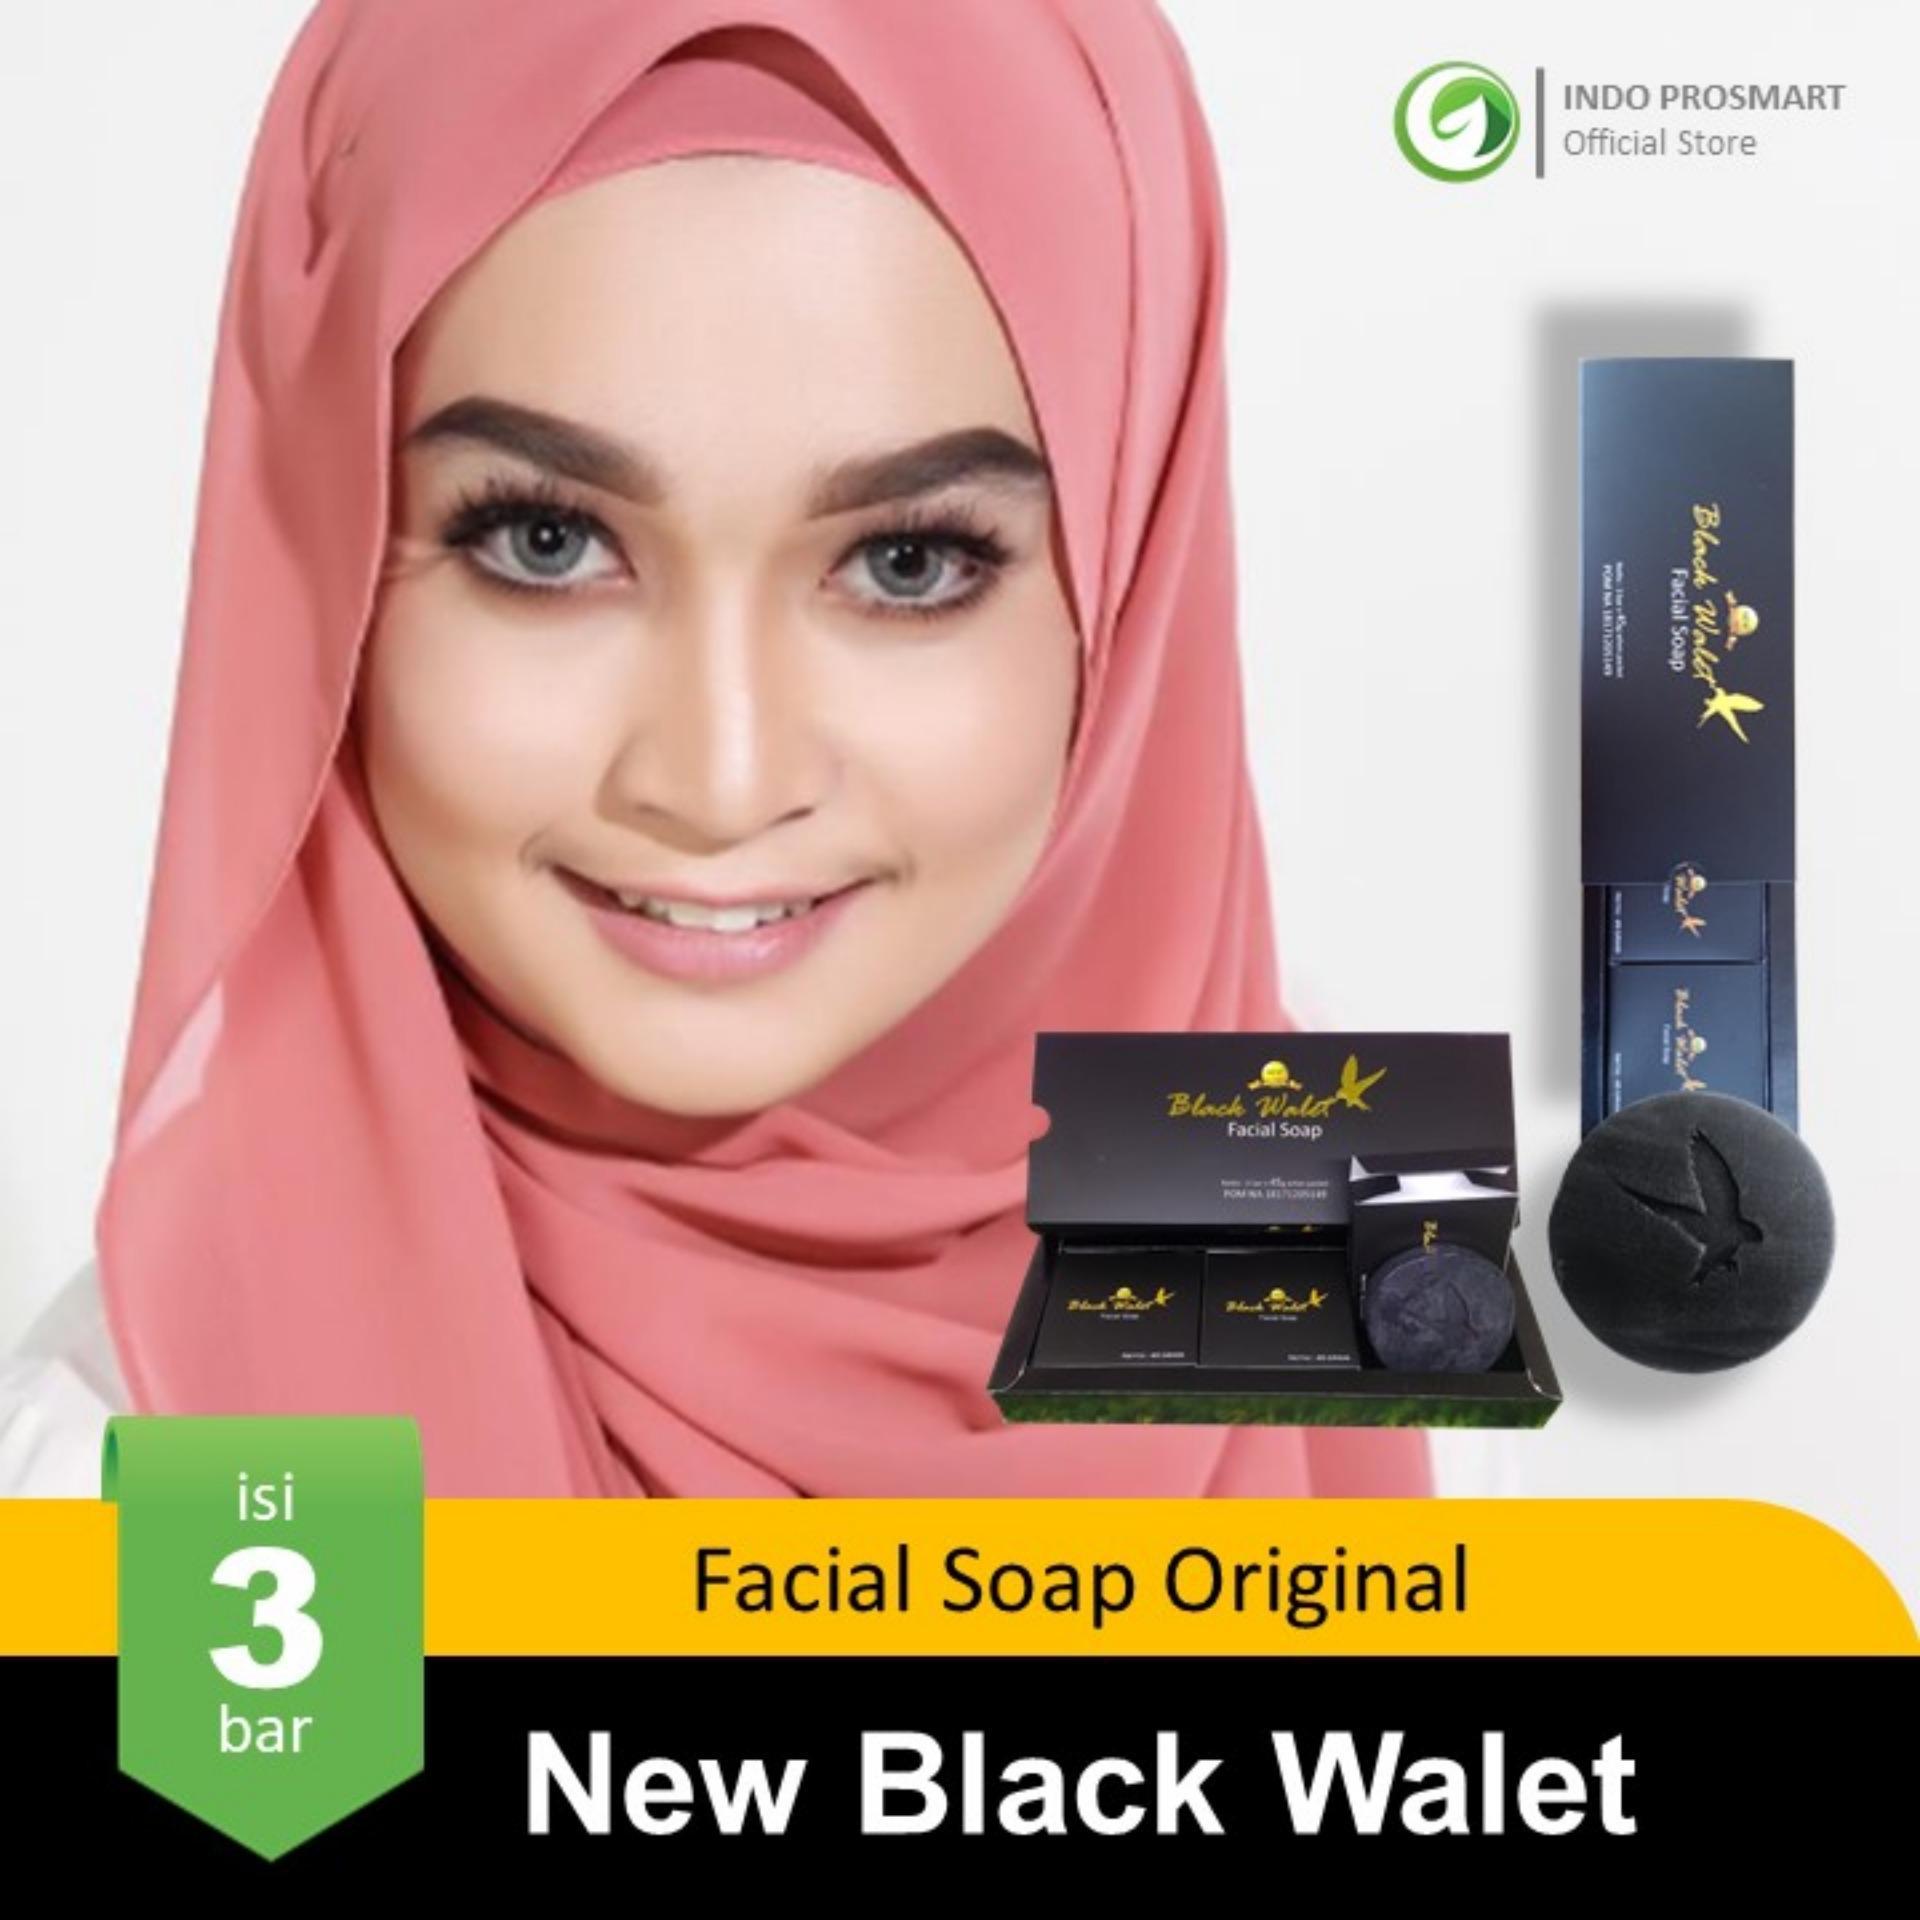 Buy Sell Cheapest New Sabun Black Best Quality Product Deals Muka Walet 1 Paket Isi 3 Bar Facial Soap Original